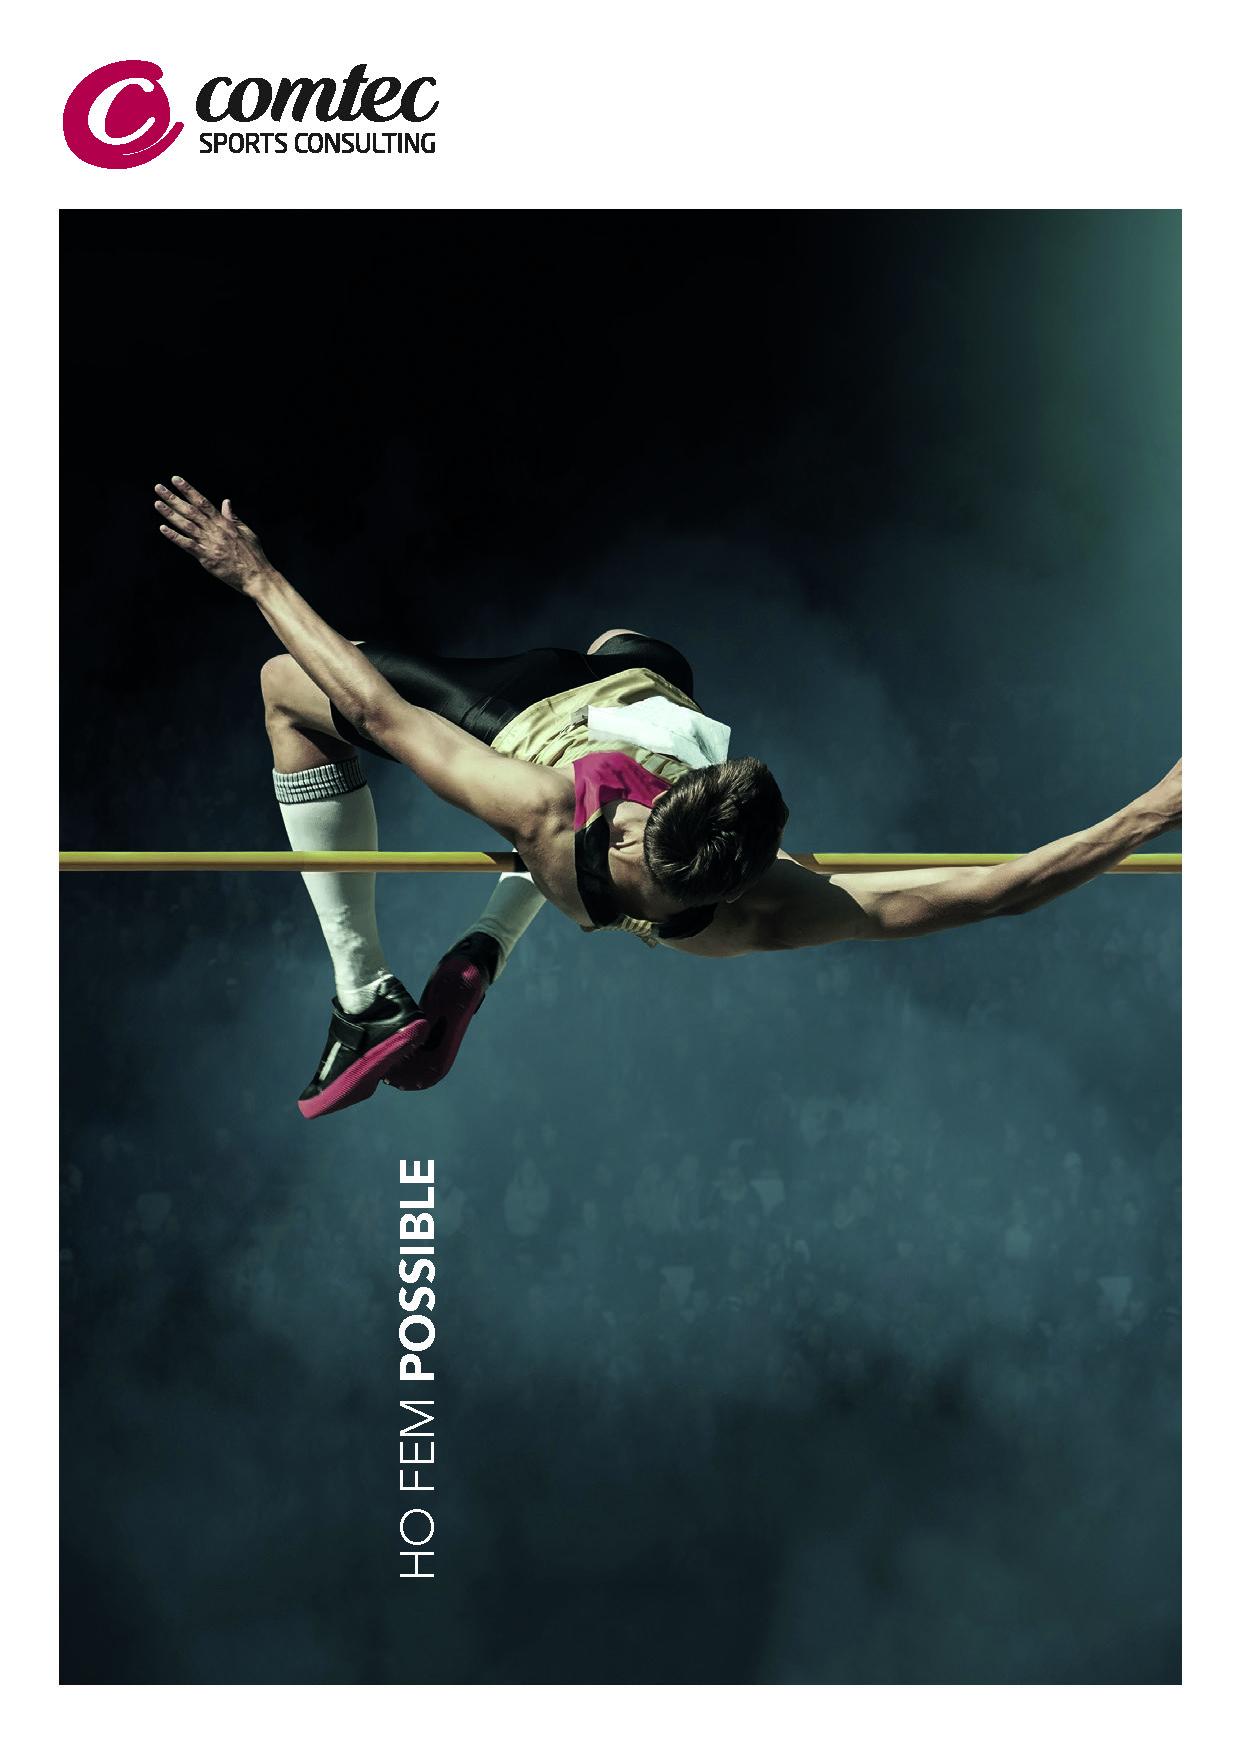 CATÀLEG Comtec_Sports_Consulting